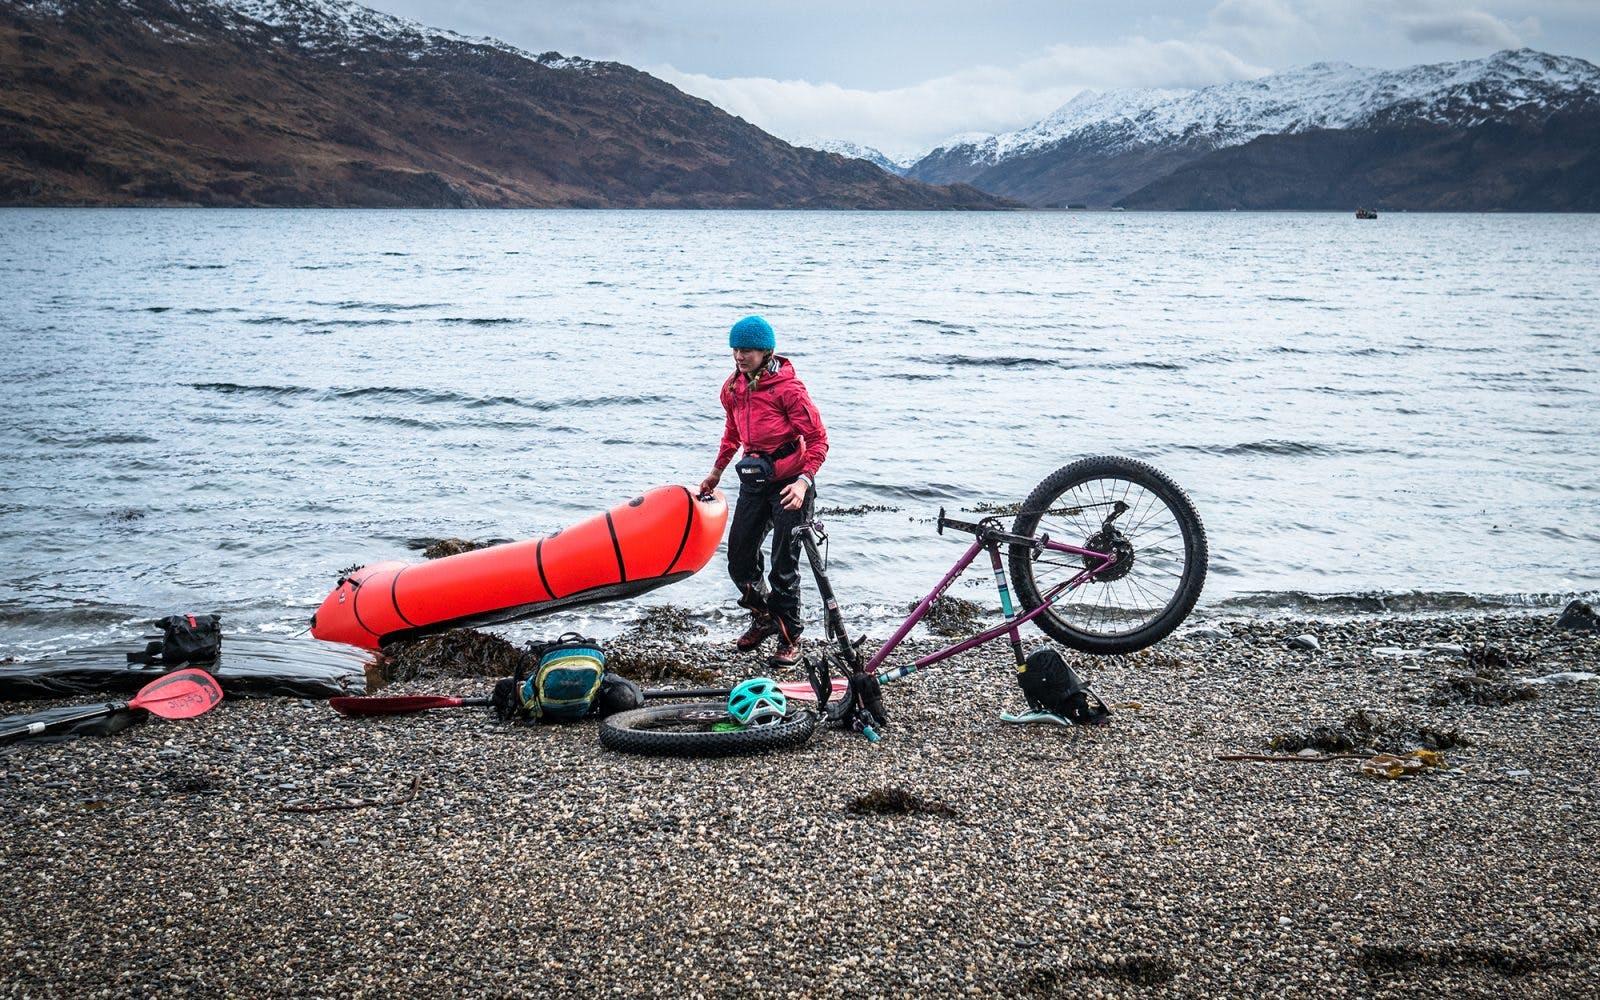 Annie Lloyd-Evans bikerafting across Scotland. Photo: Huw Oliver.